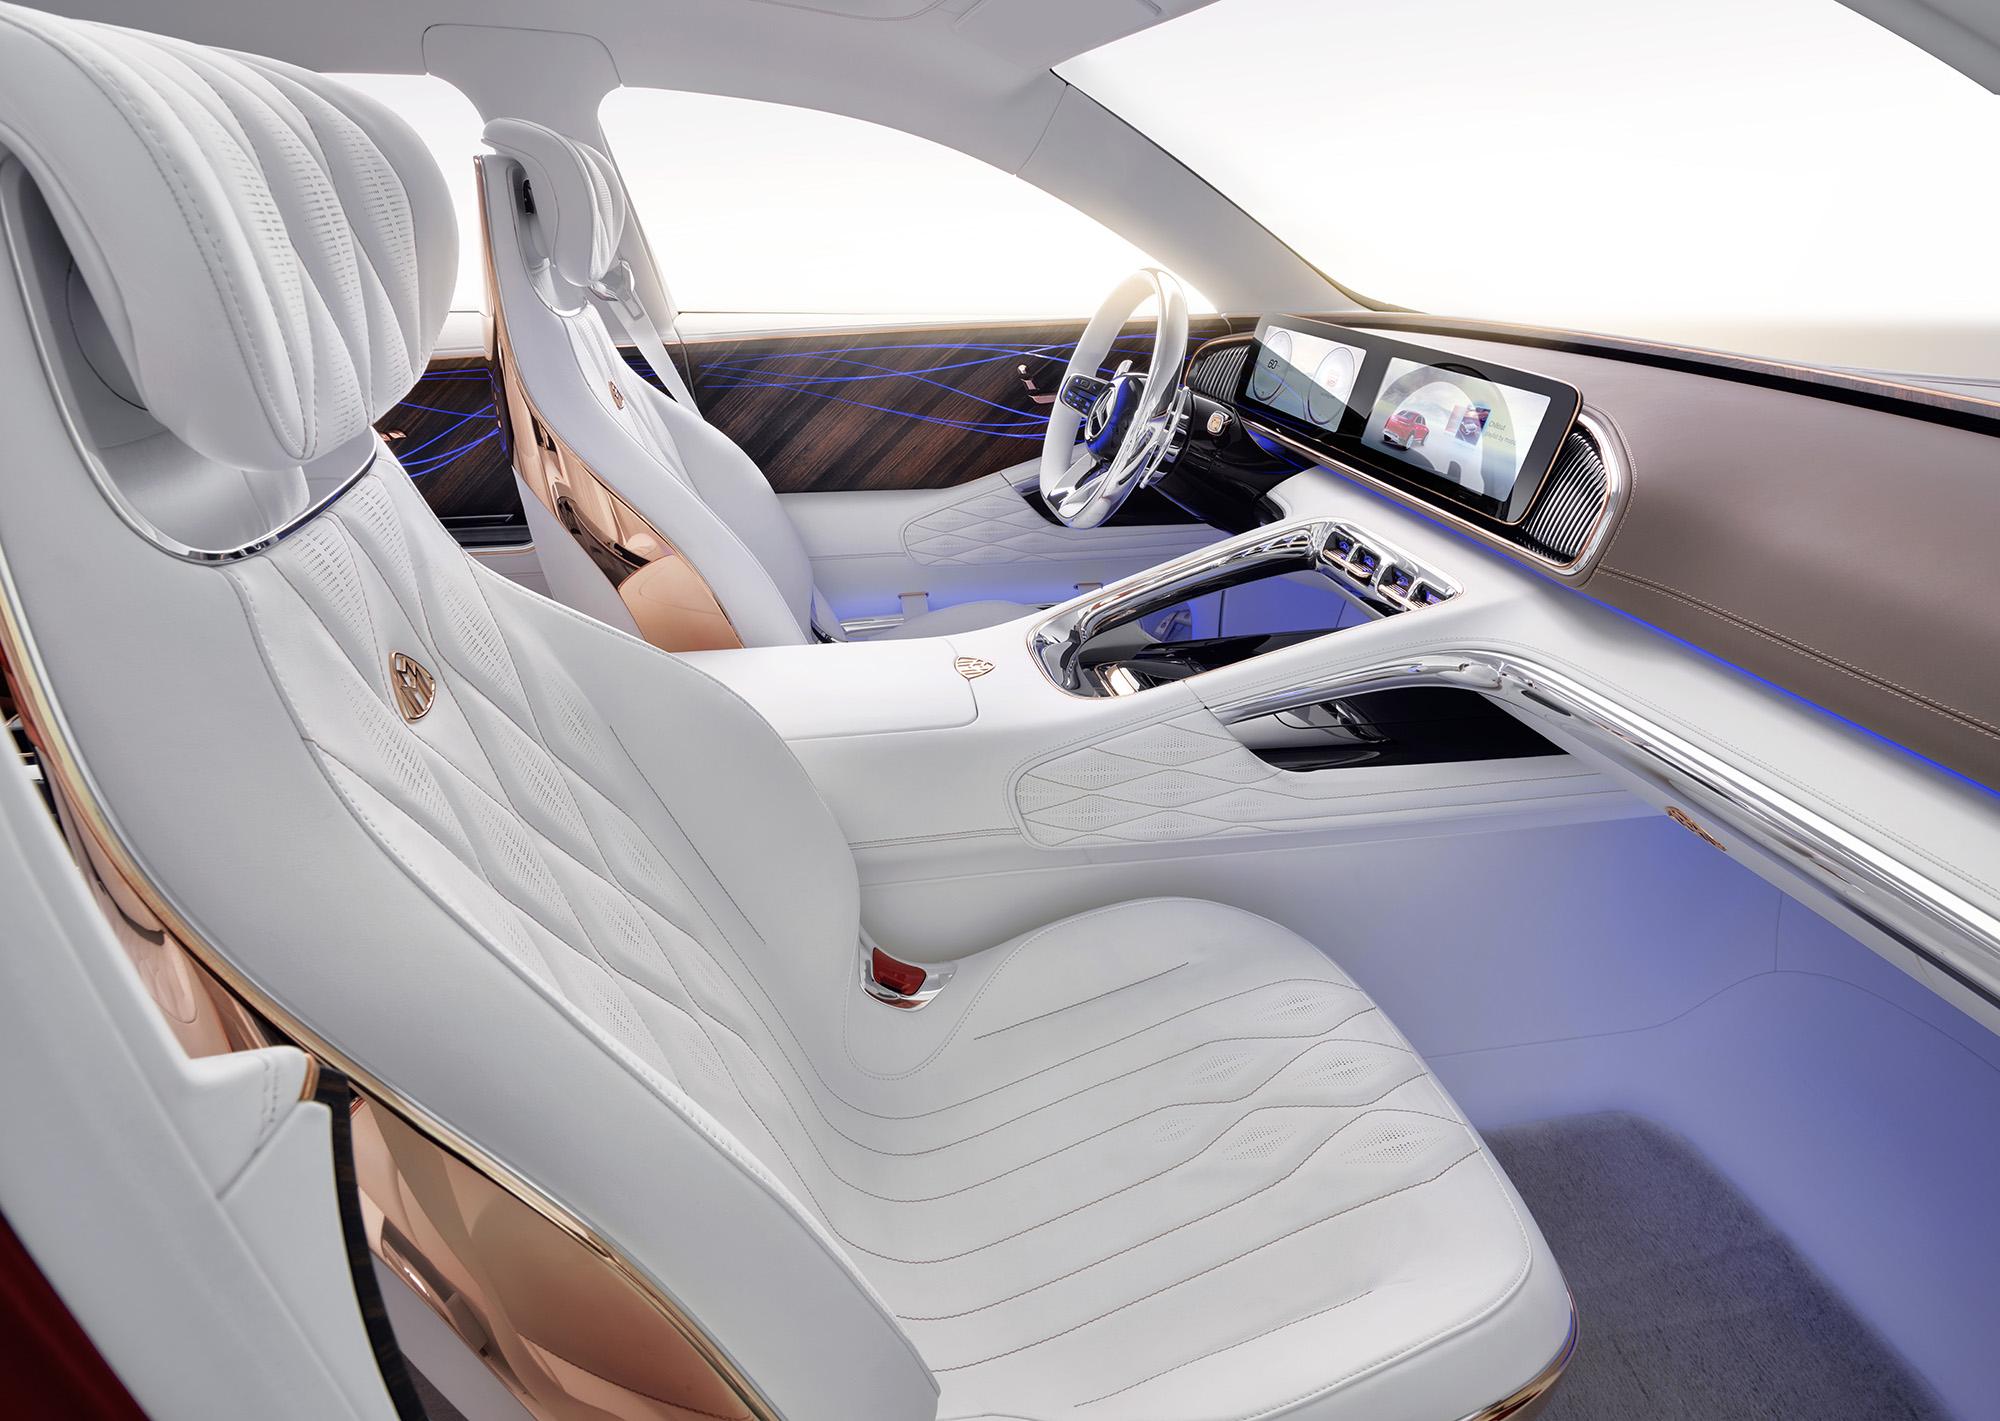 Mercedes 'Ultimate Luxury' SUV Includes Actual Tea Set ...